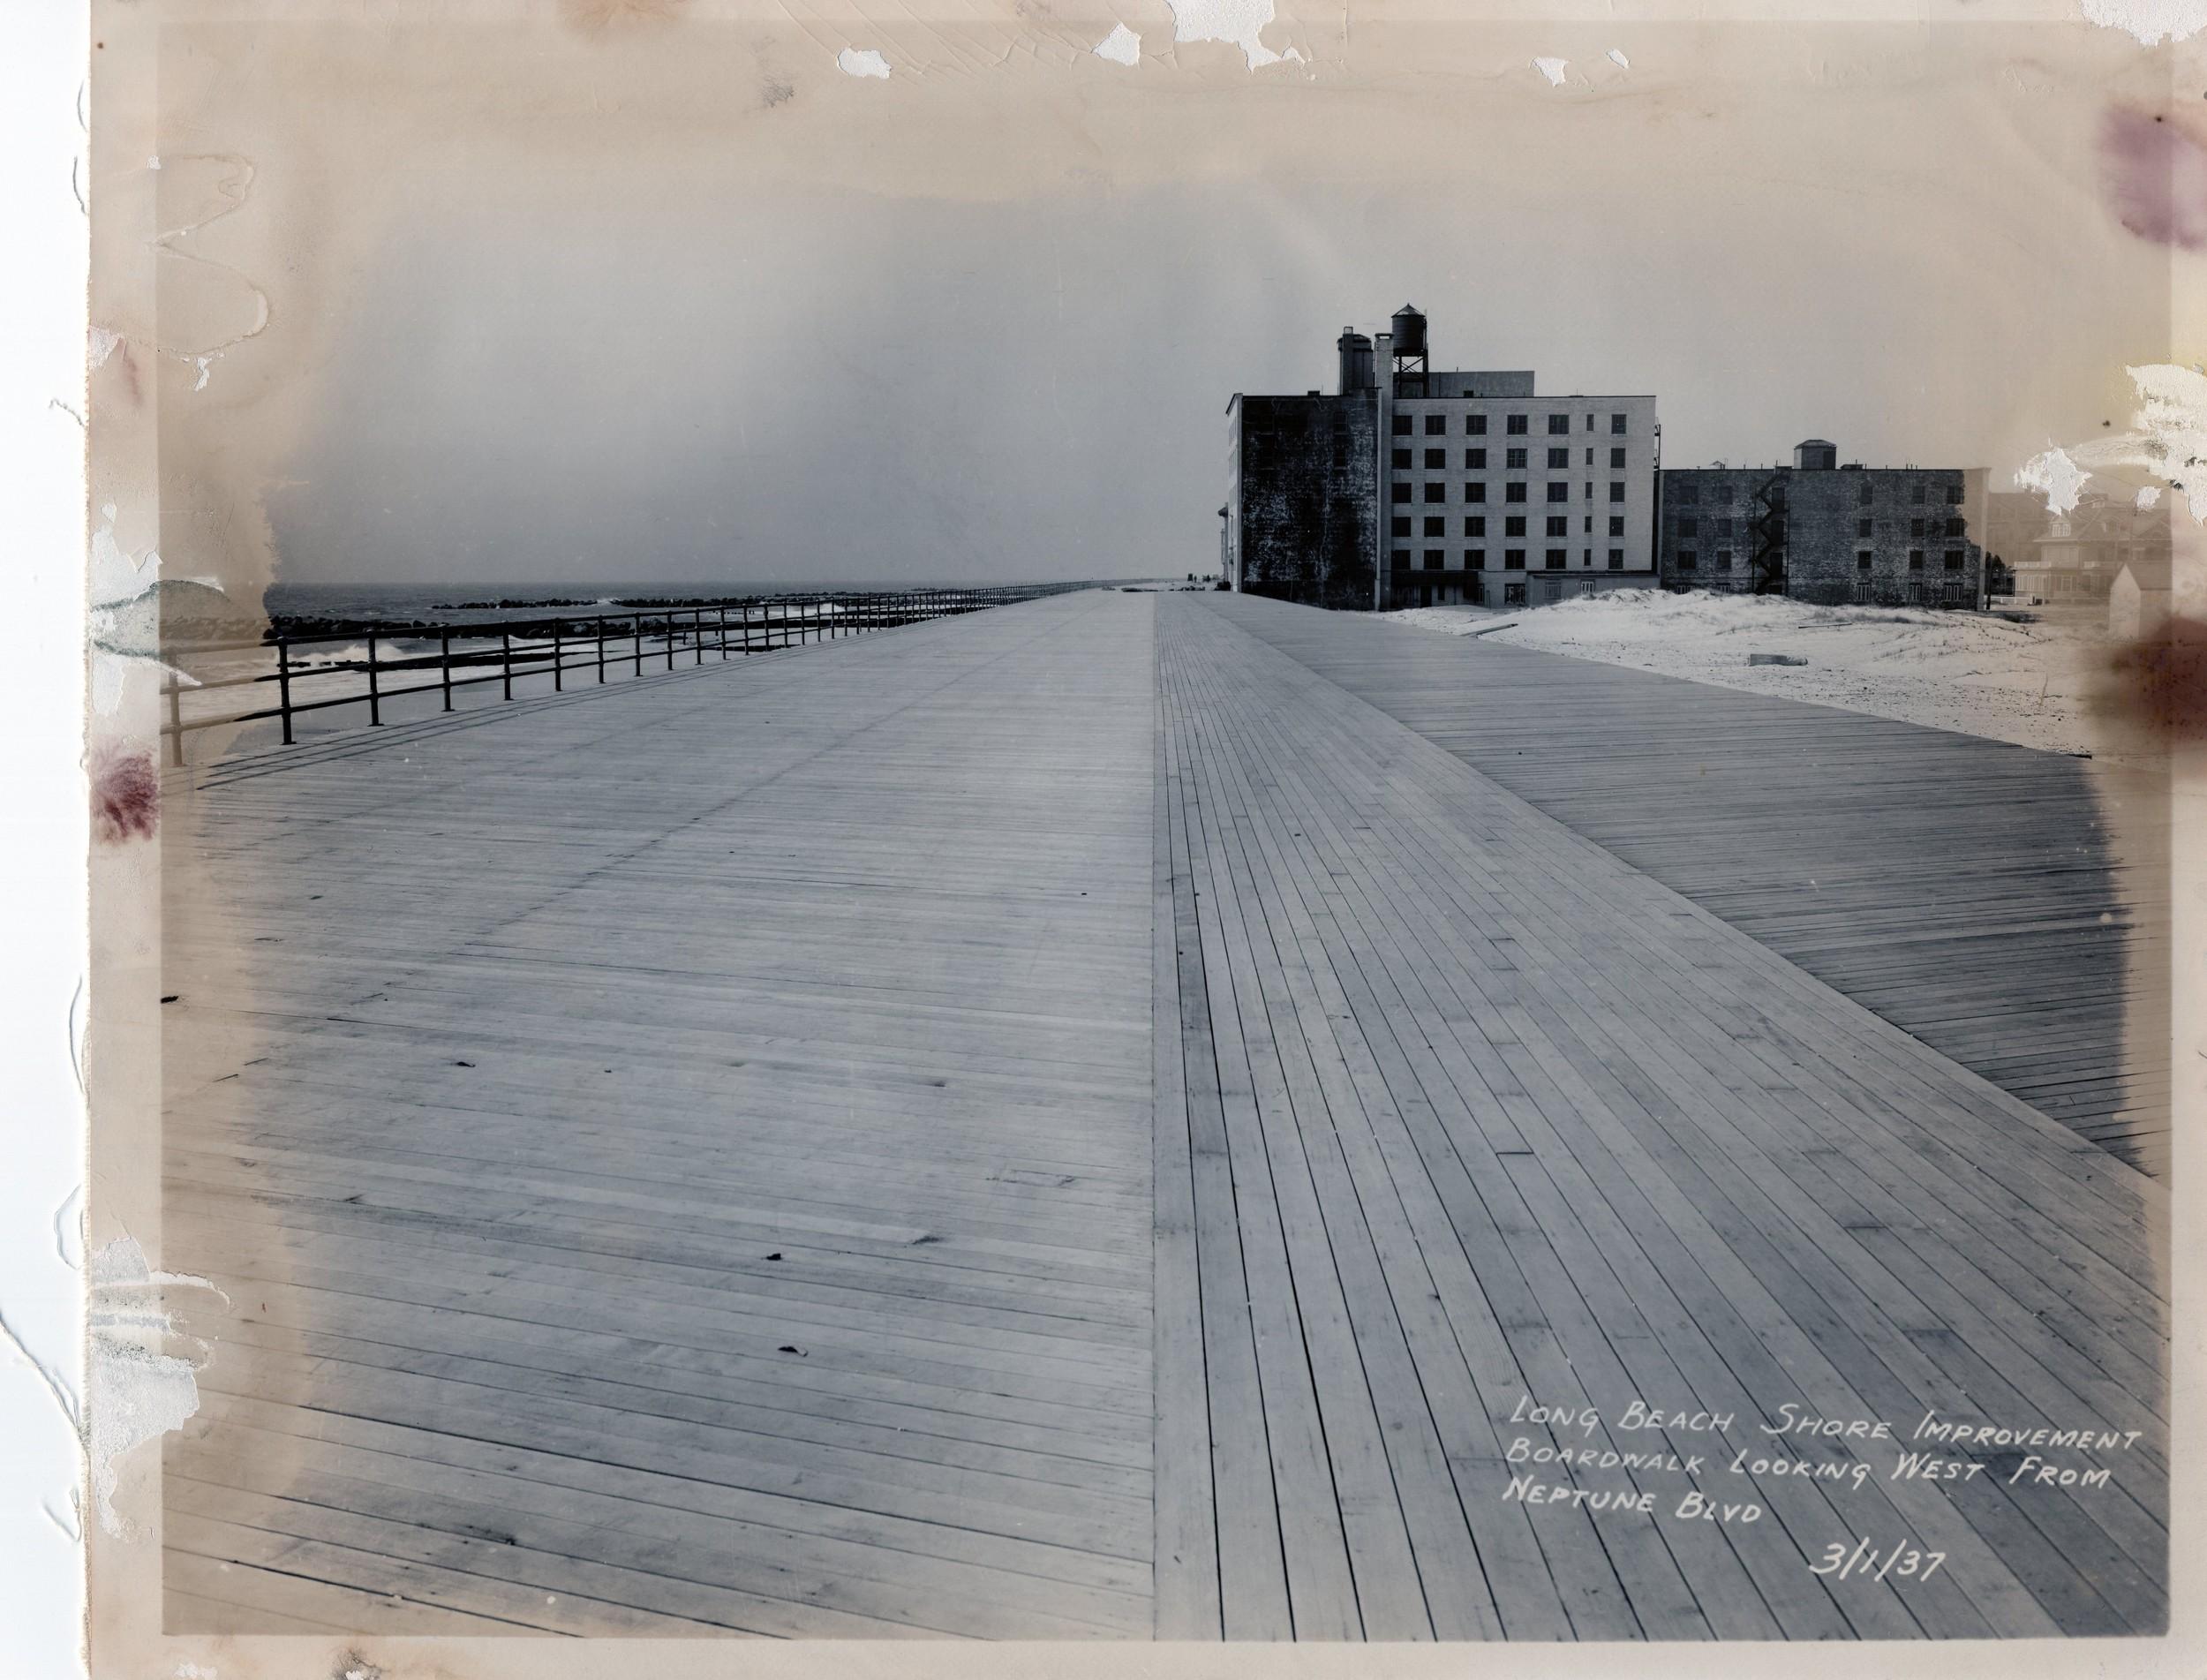 Boardwalk 1937 Neptune Blvd